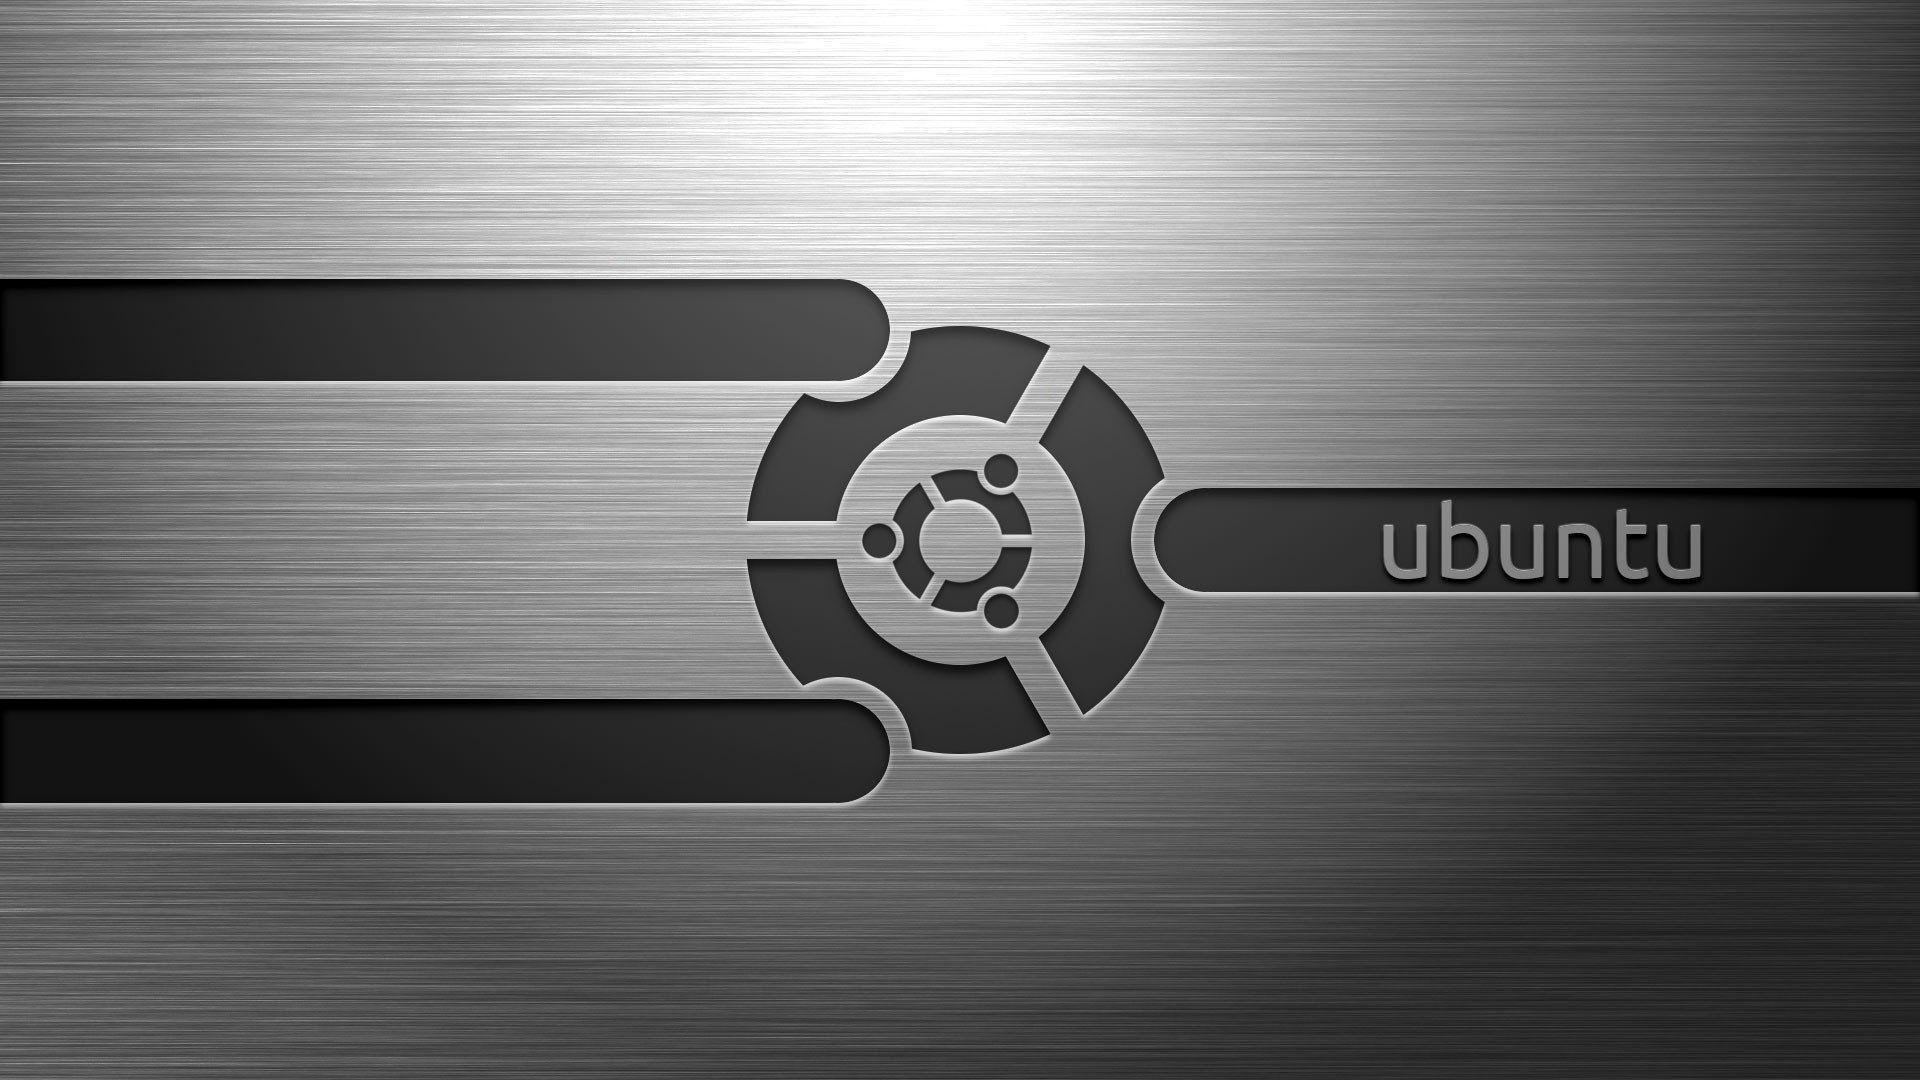 Cool Desktop Backgrounds For Ubuntu